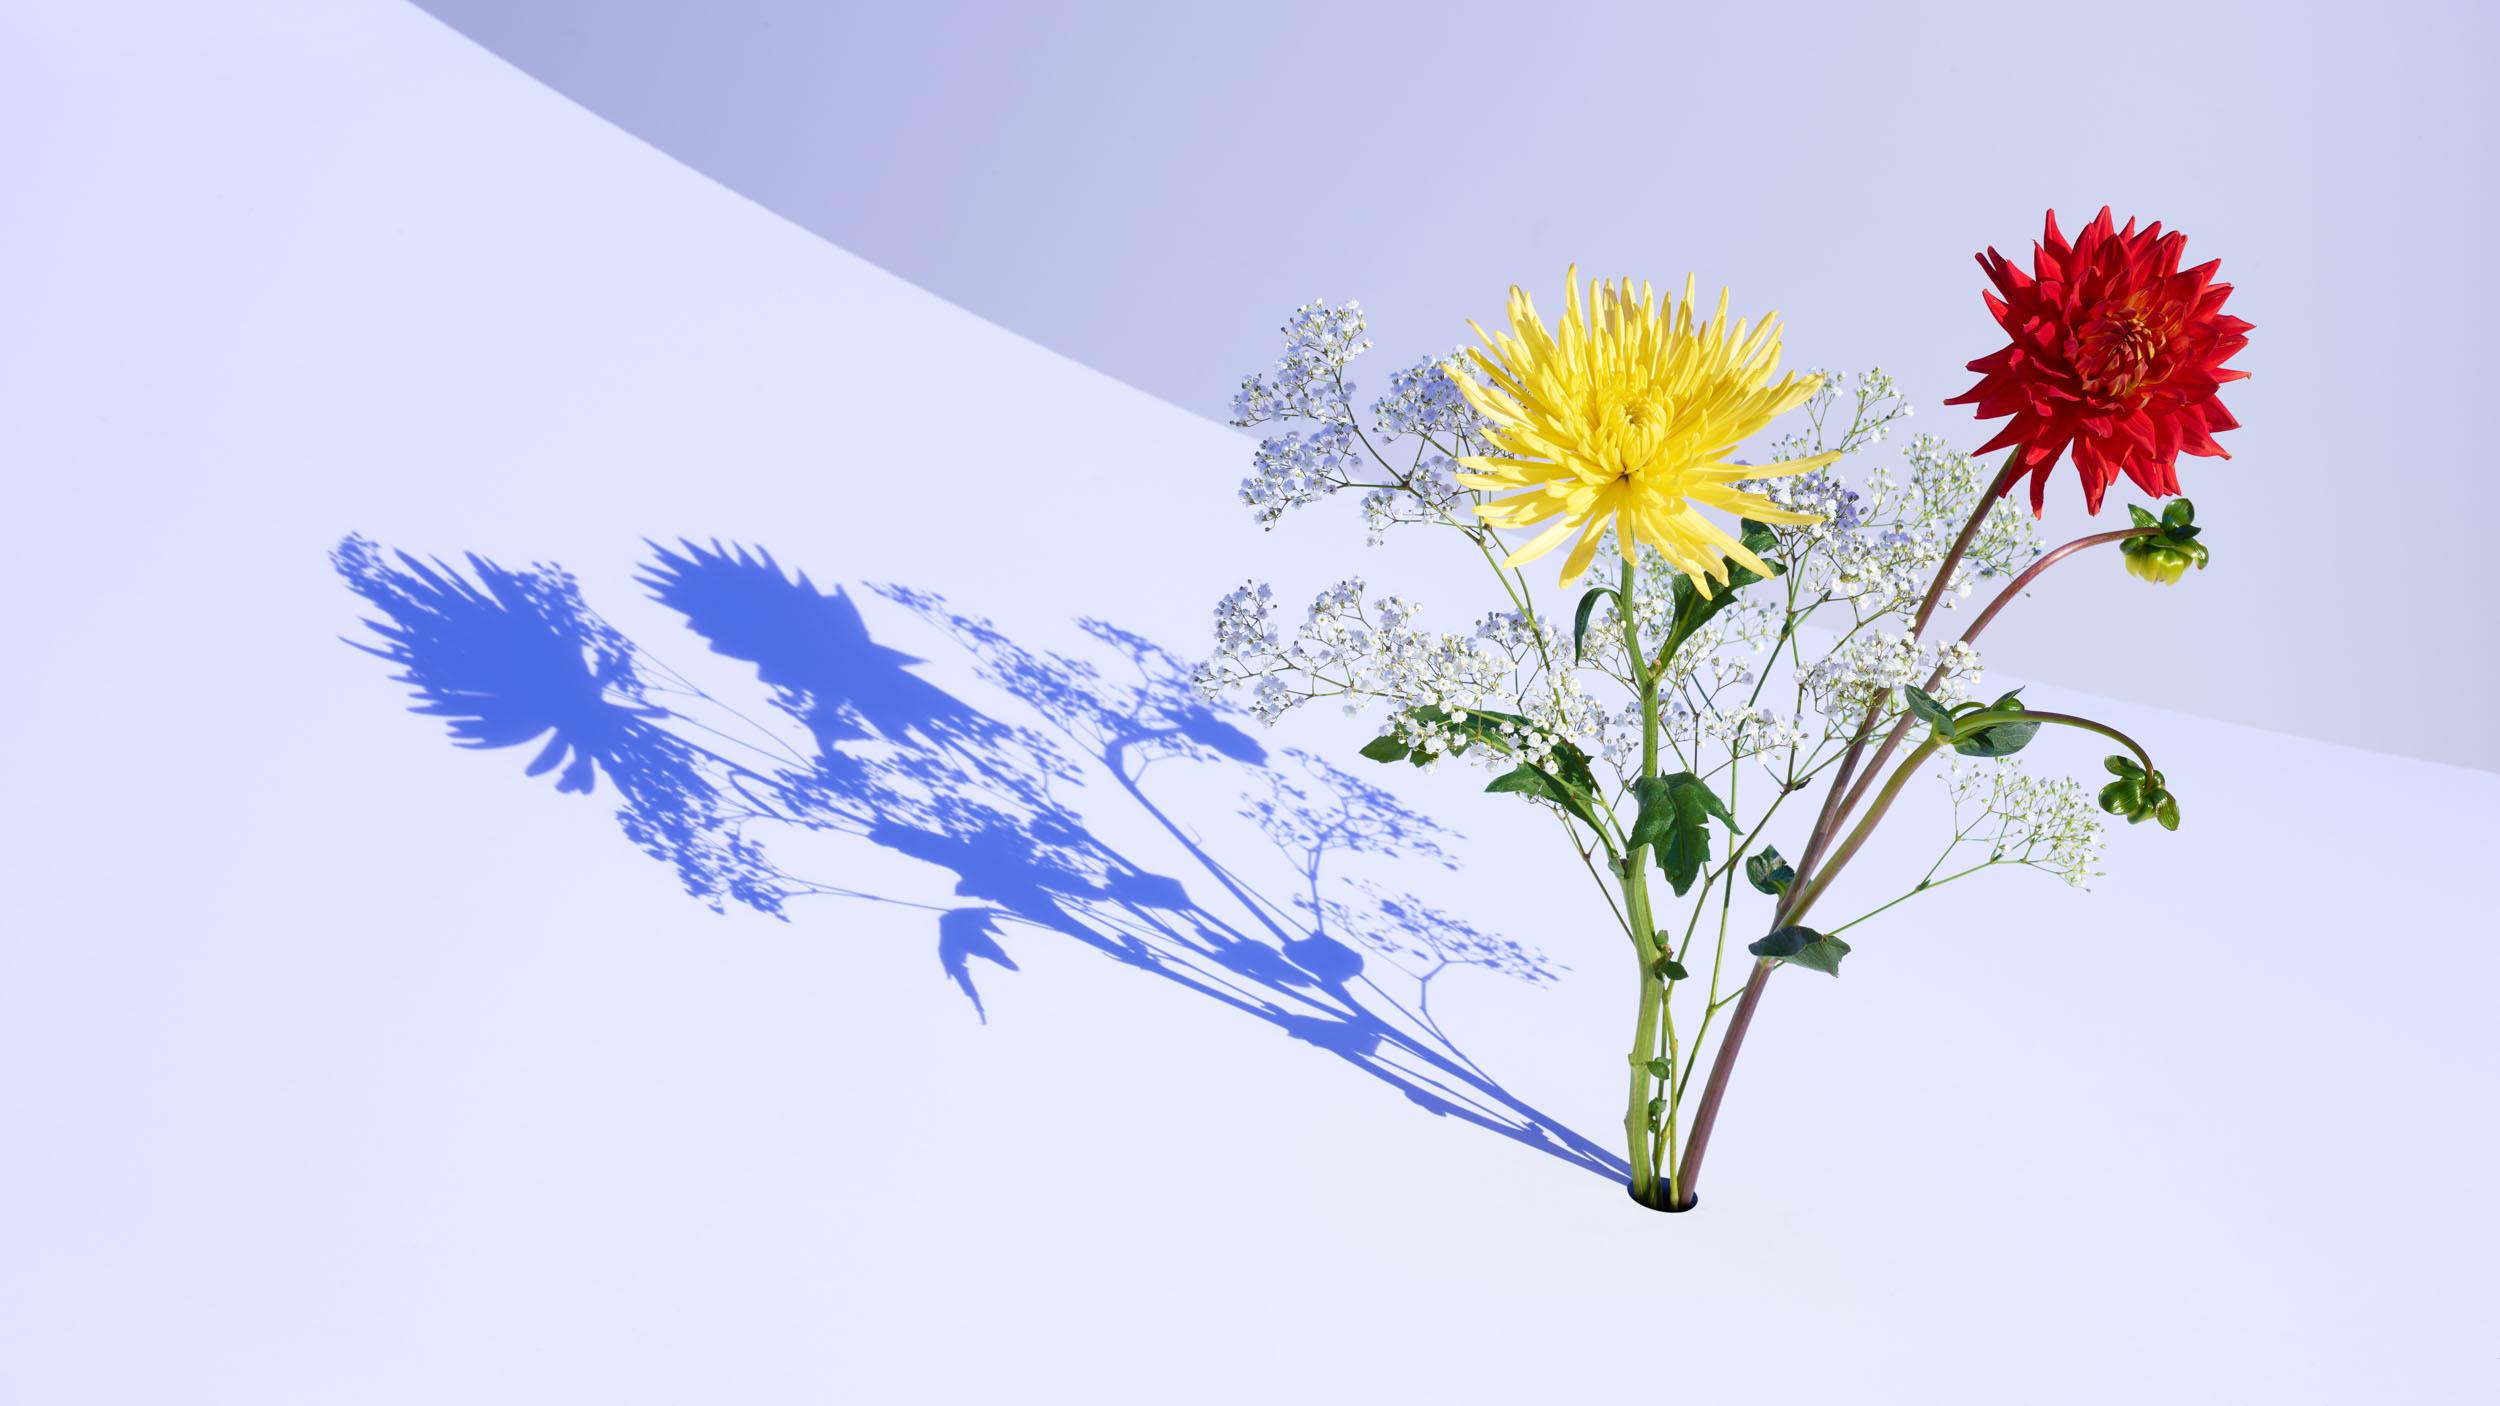 170907_FlowerHole_2299_V1_32142-PB-4.jpg